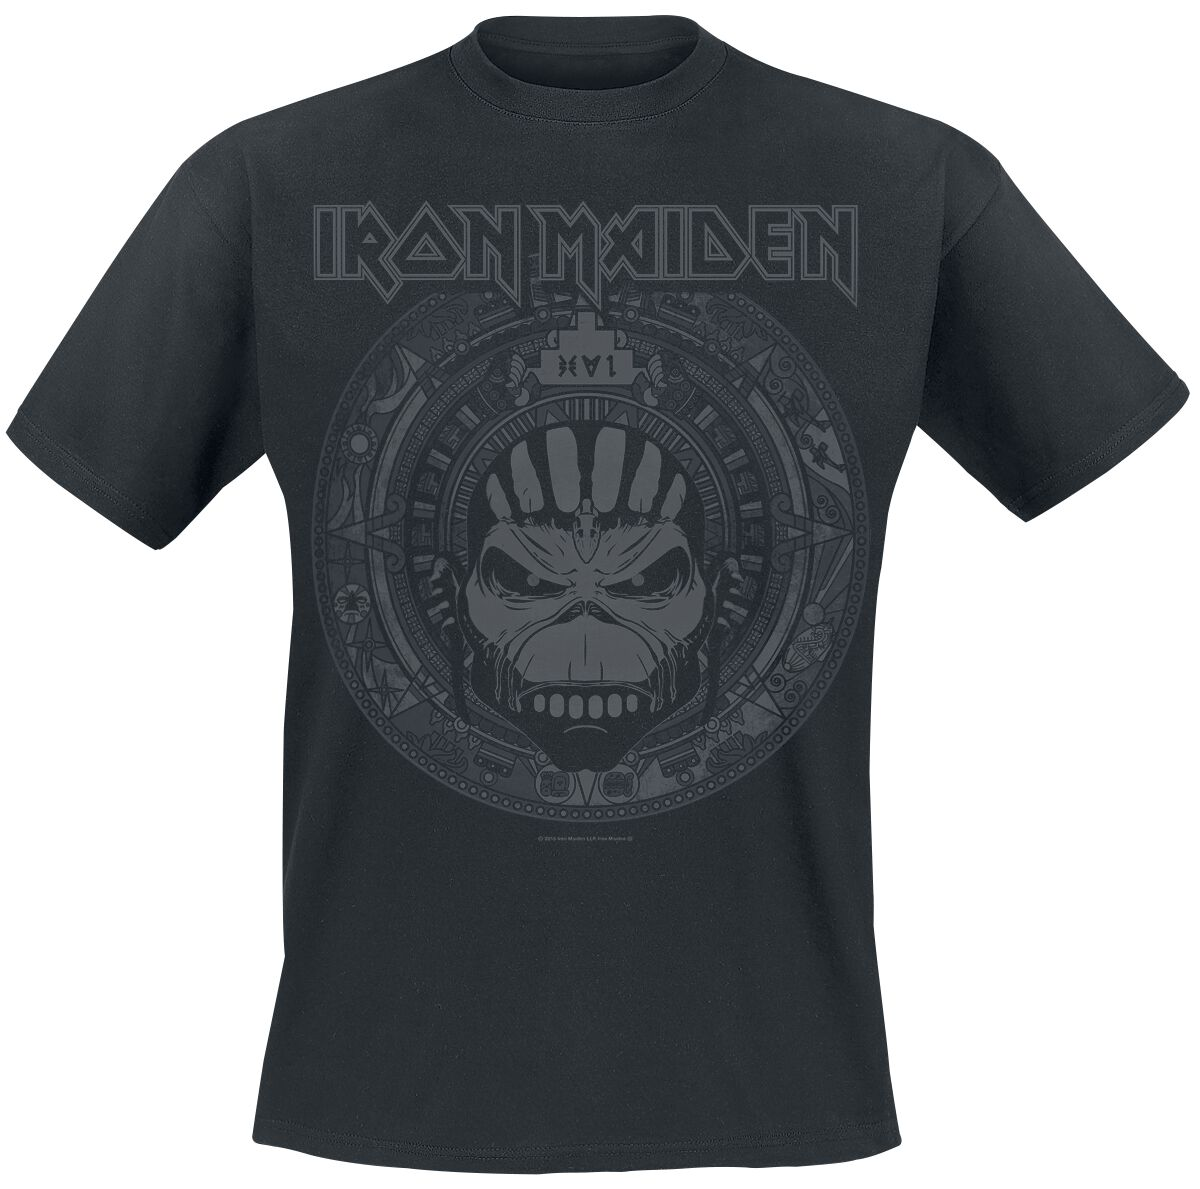 Iron Maiden - Senjutsu (2021) - Página 12 325008a-emp